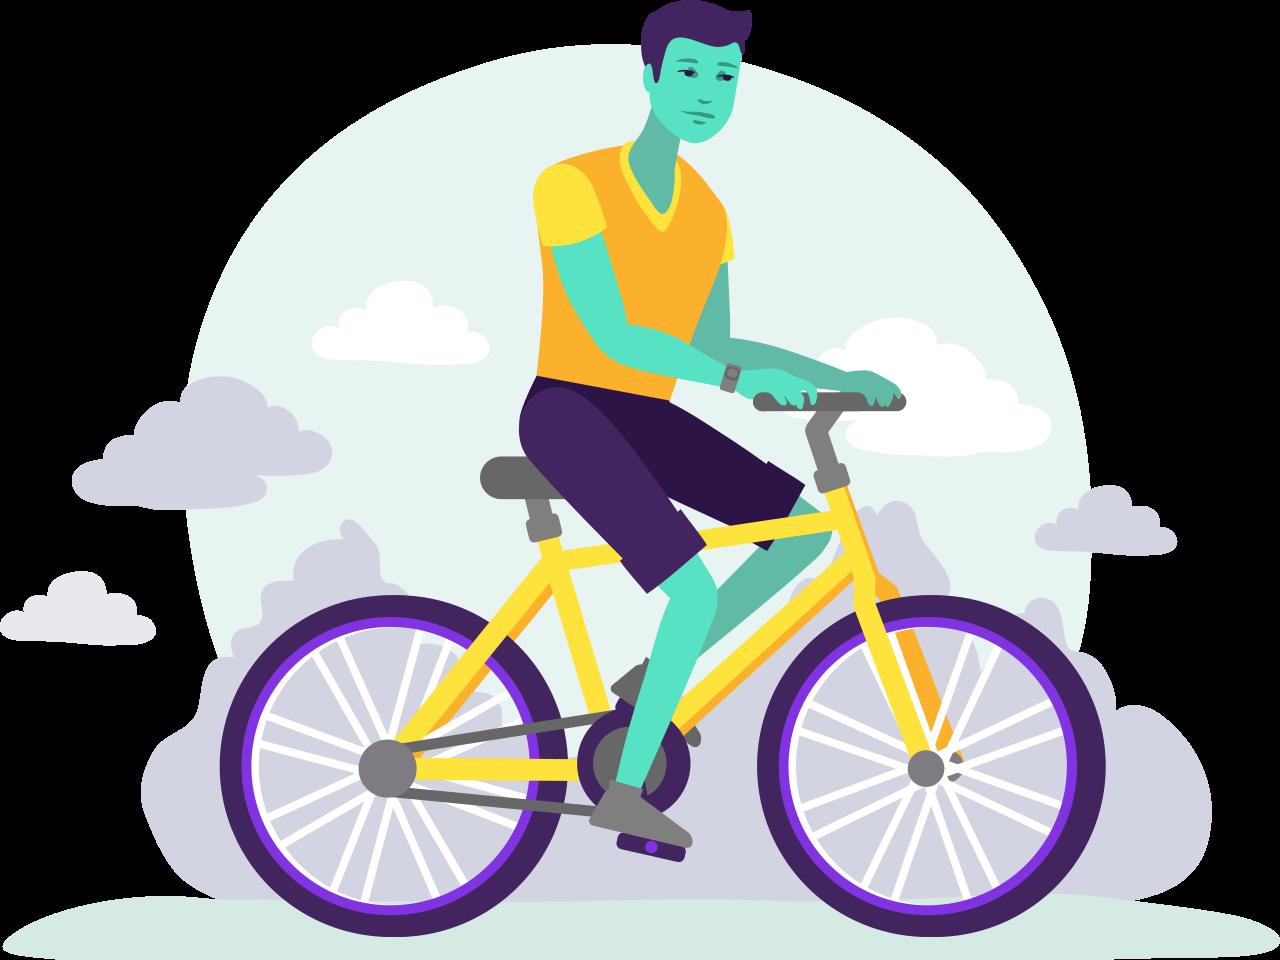 Launching Cyclist Insurance app design granadilla illustration